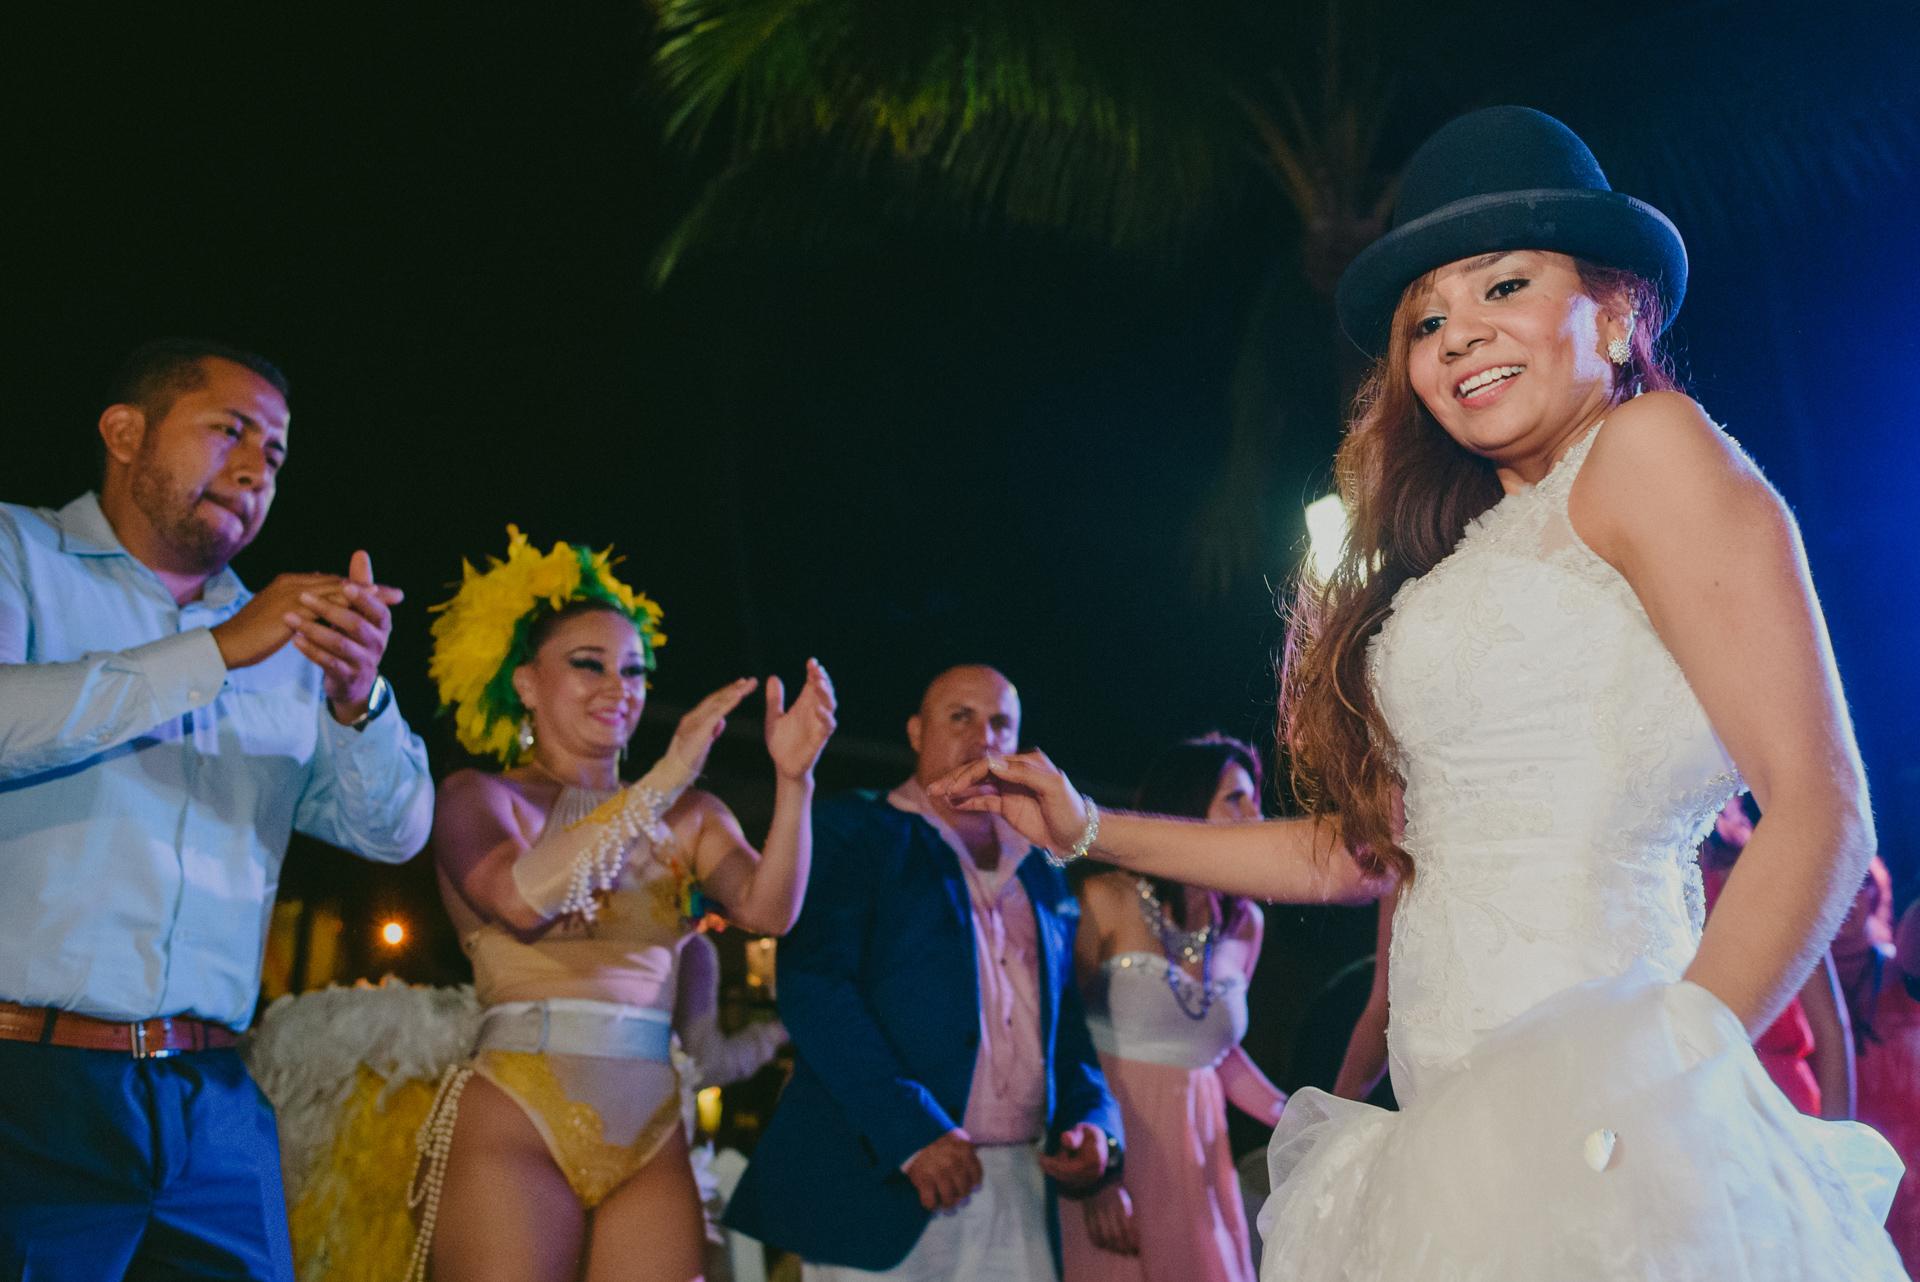 Wedding N&M BLOG luishoudin.com (166 de 174)